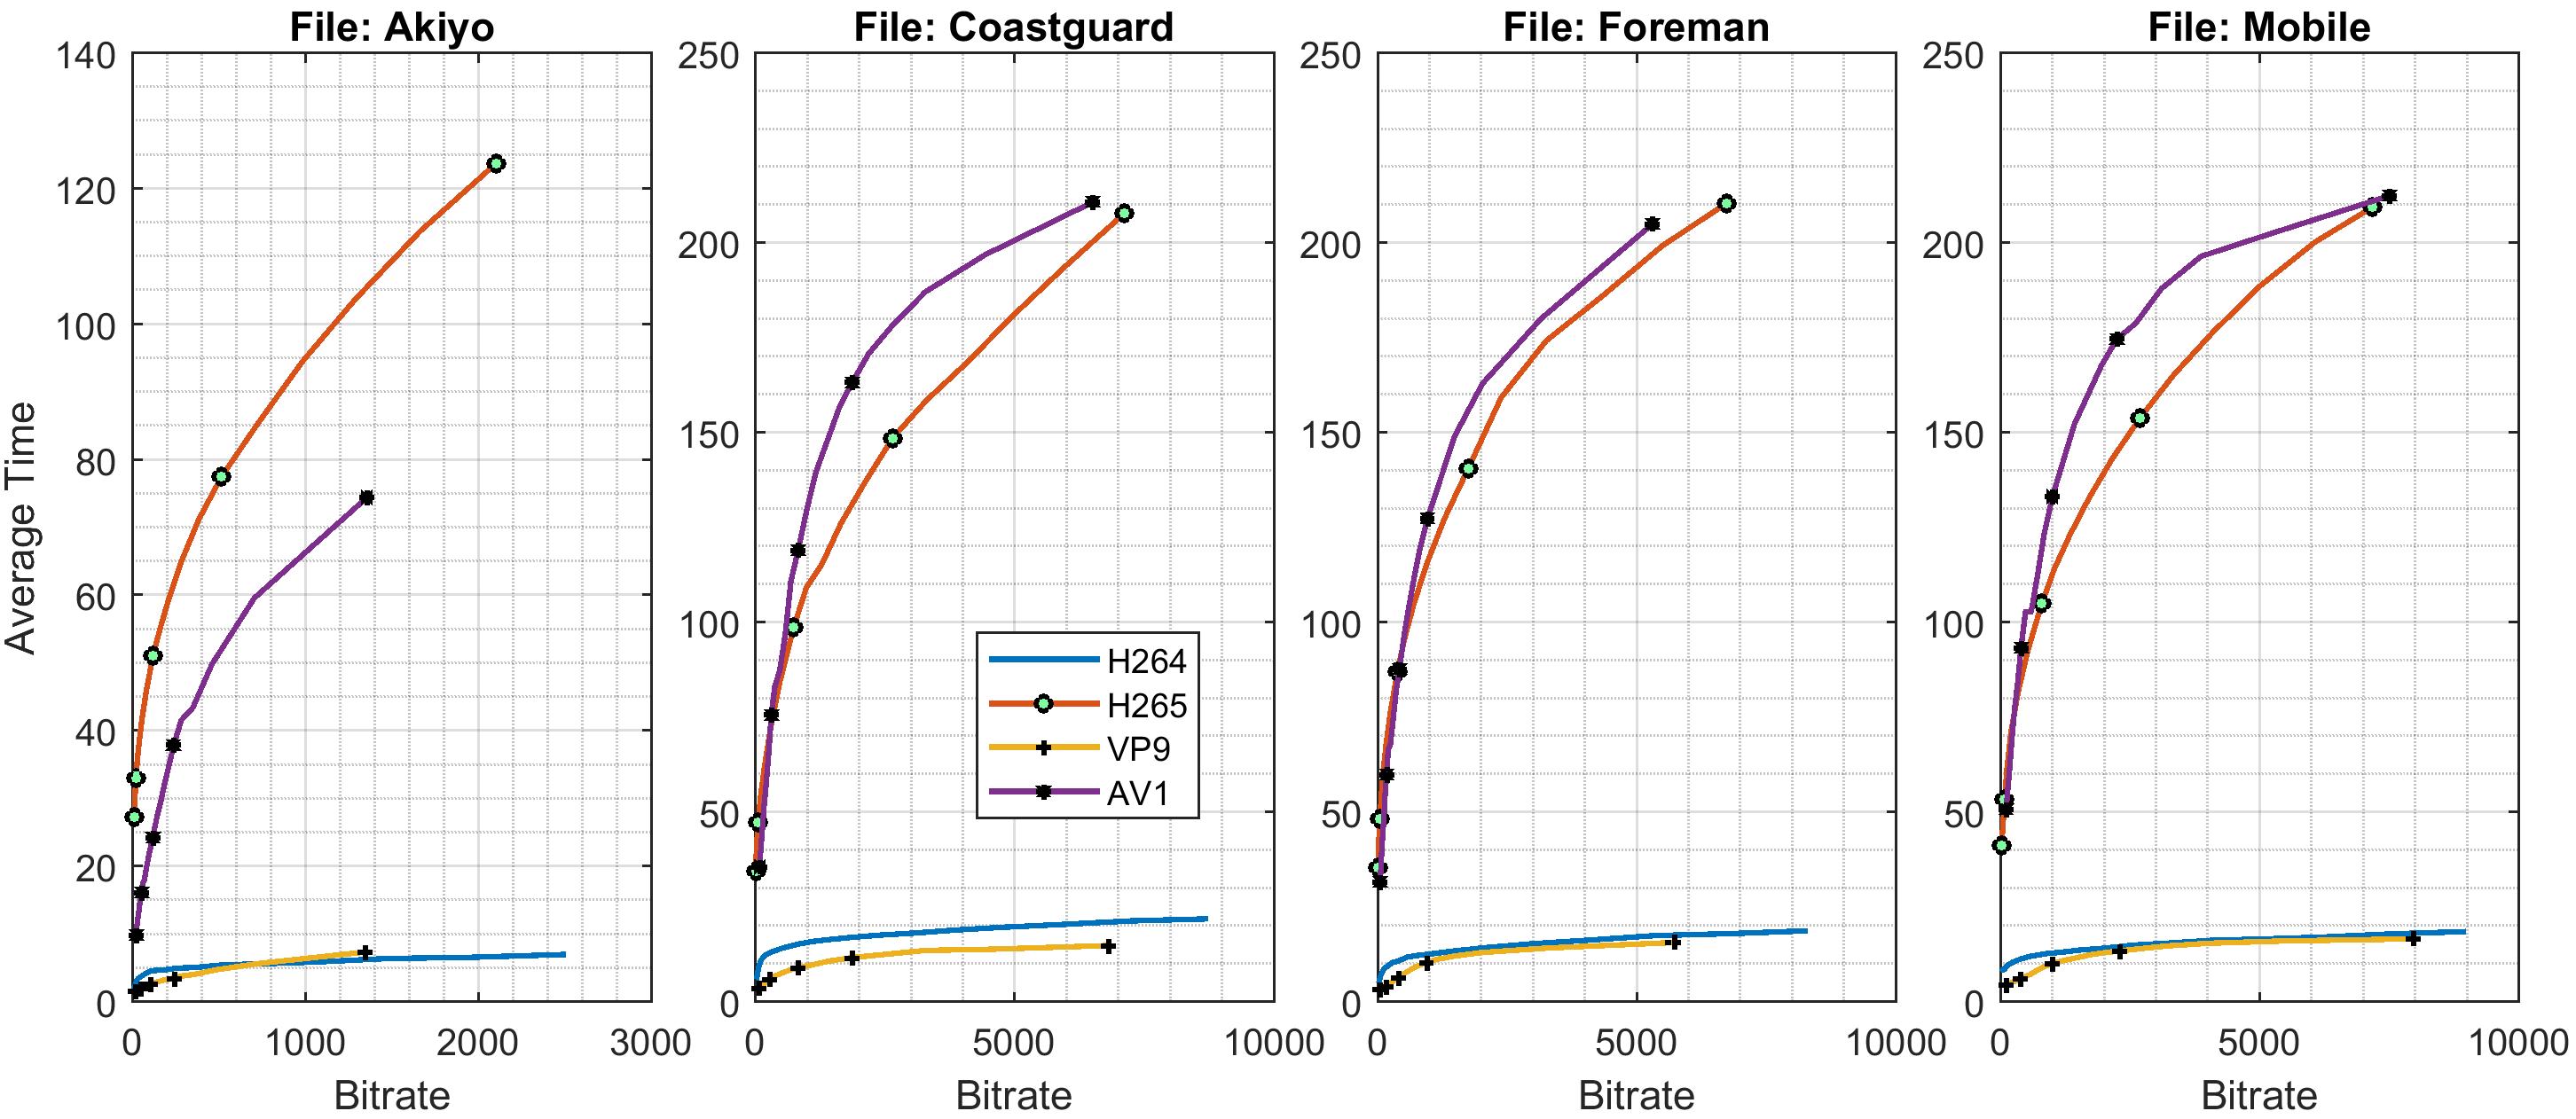 Video Codec Comparison (H 264, H 265, VP9 and AV1): FIGURES